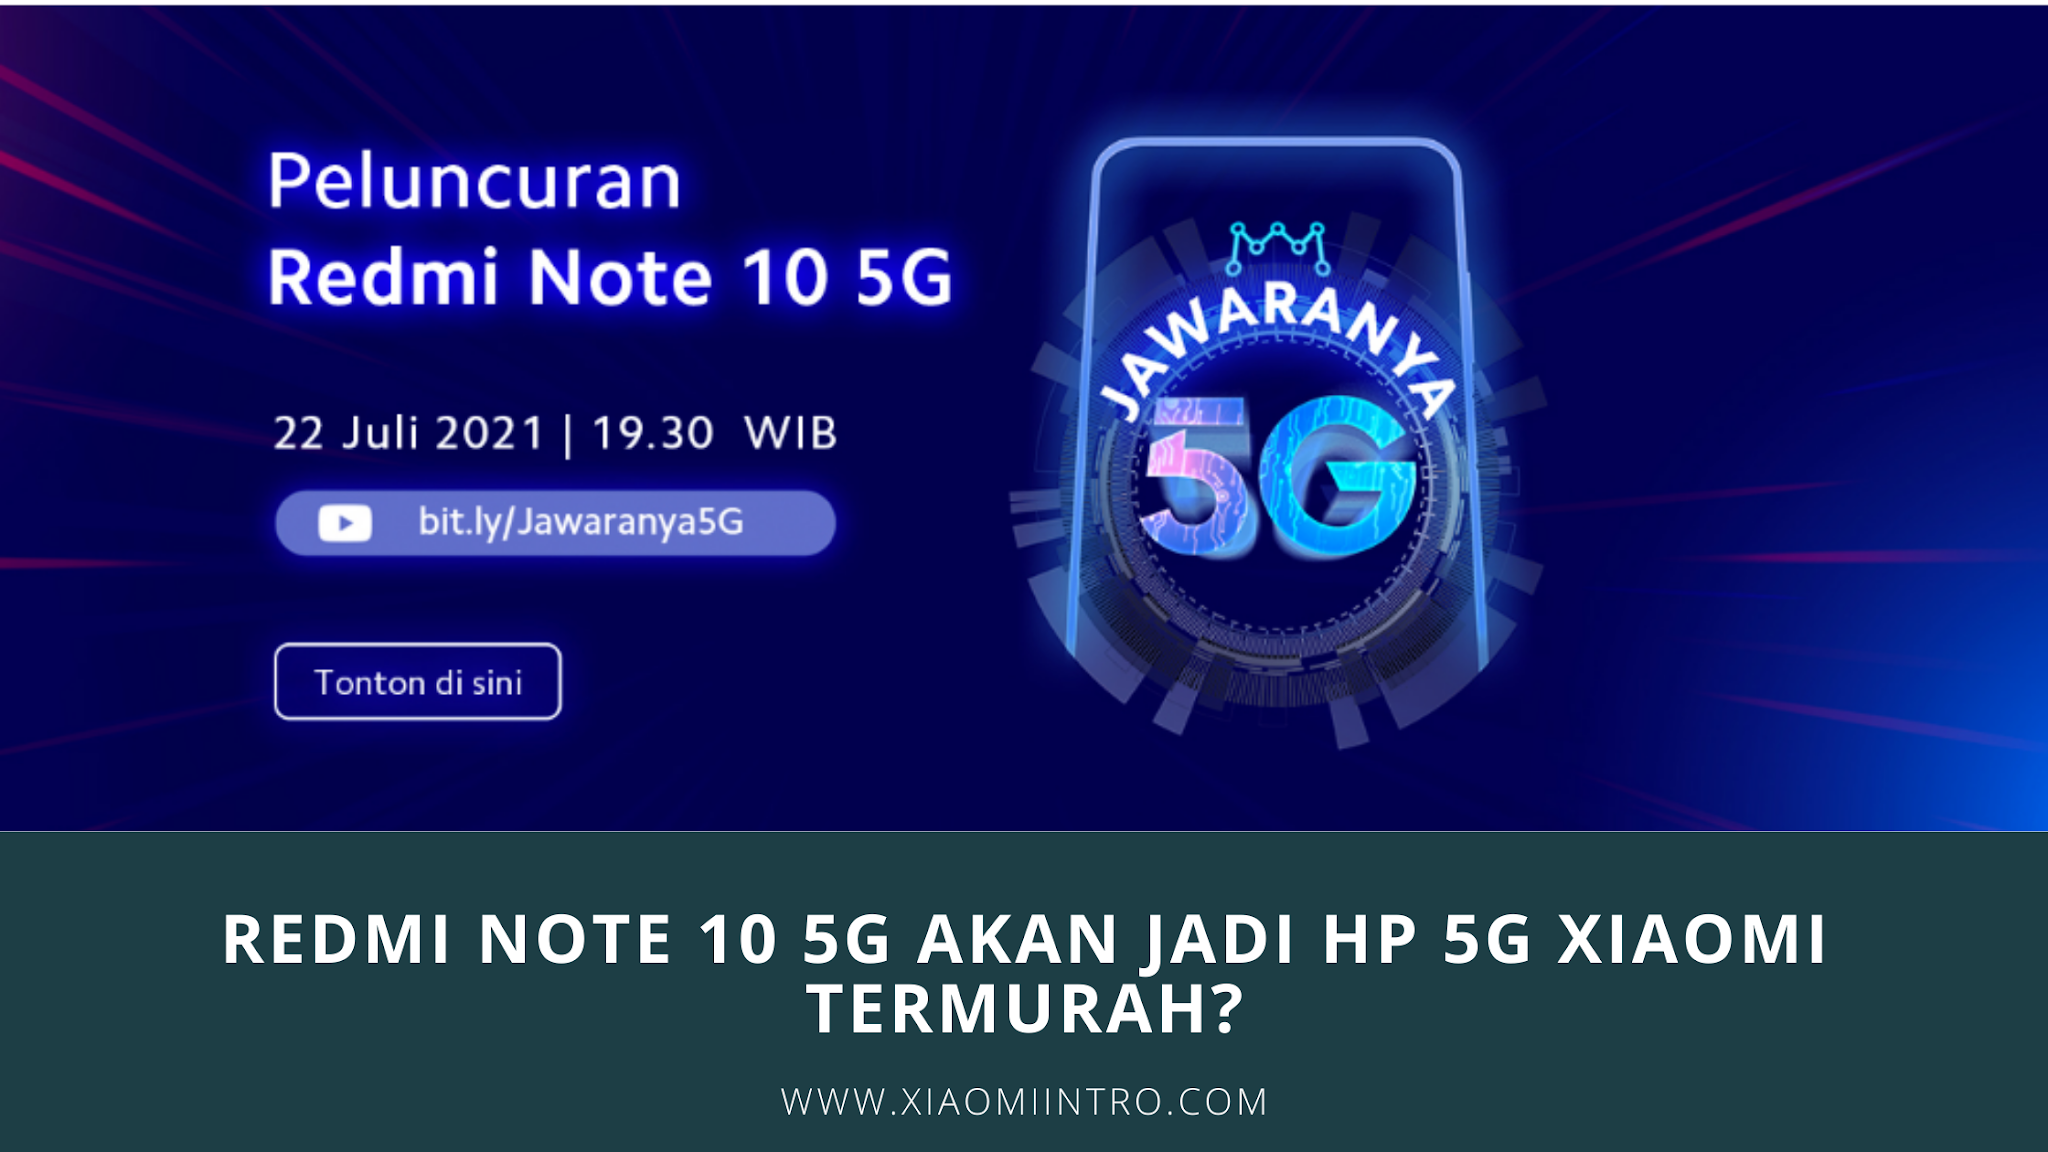 Redmi Note 10 5G Akan Jadi Hp 5G XiaomiTermurah?